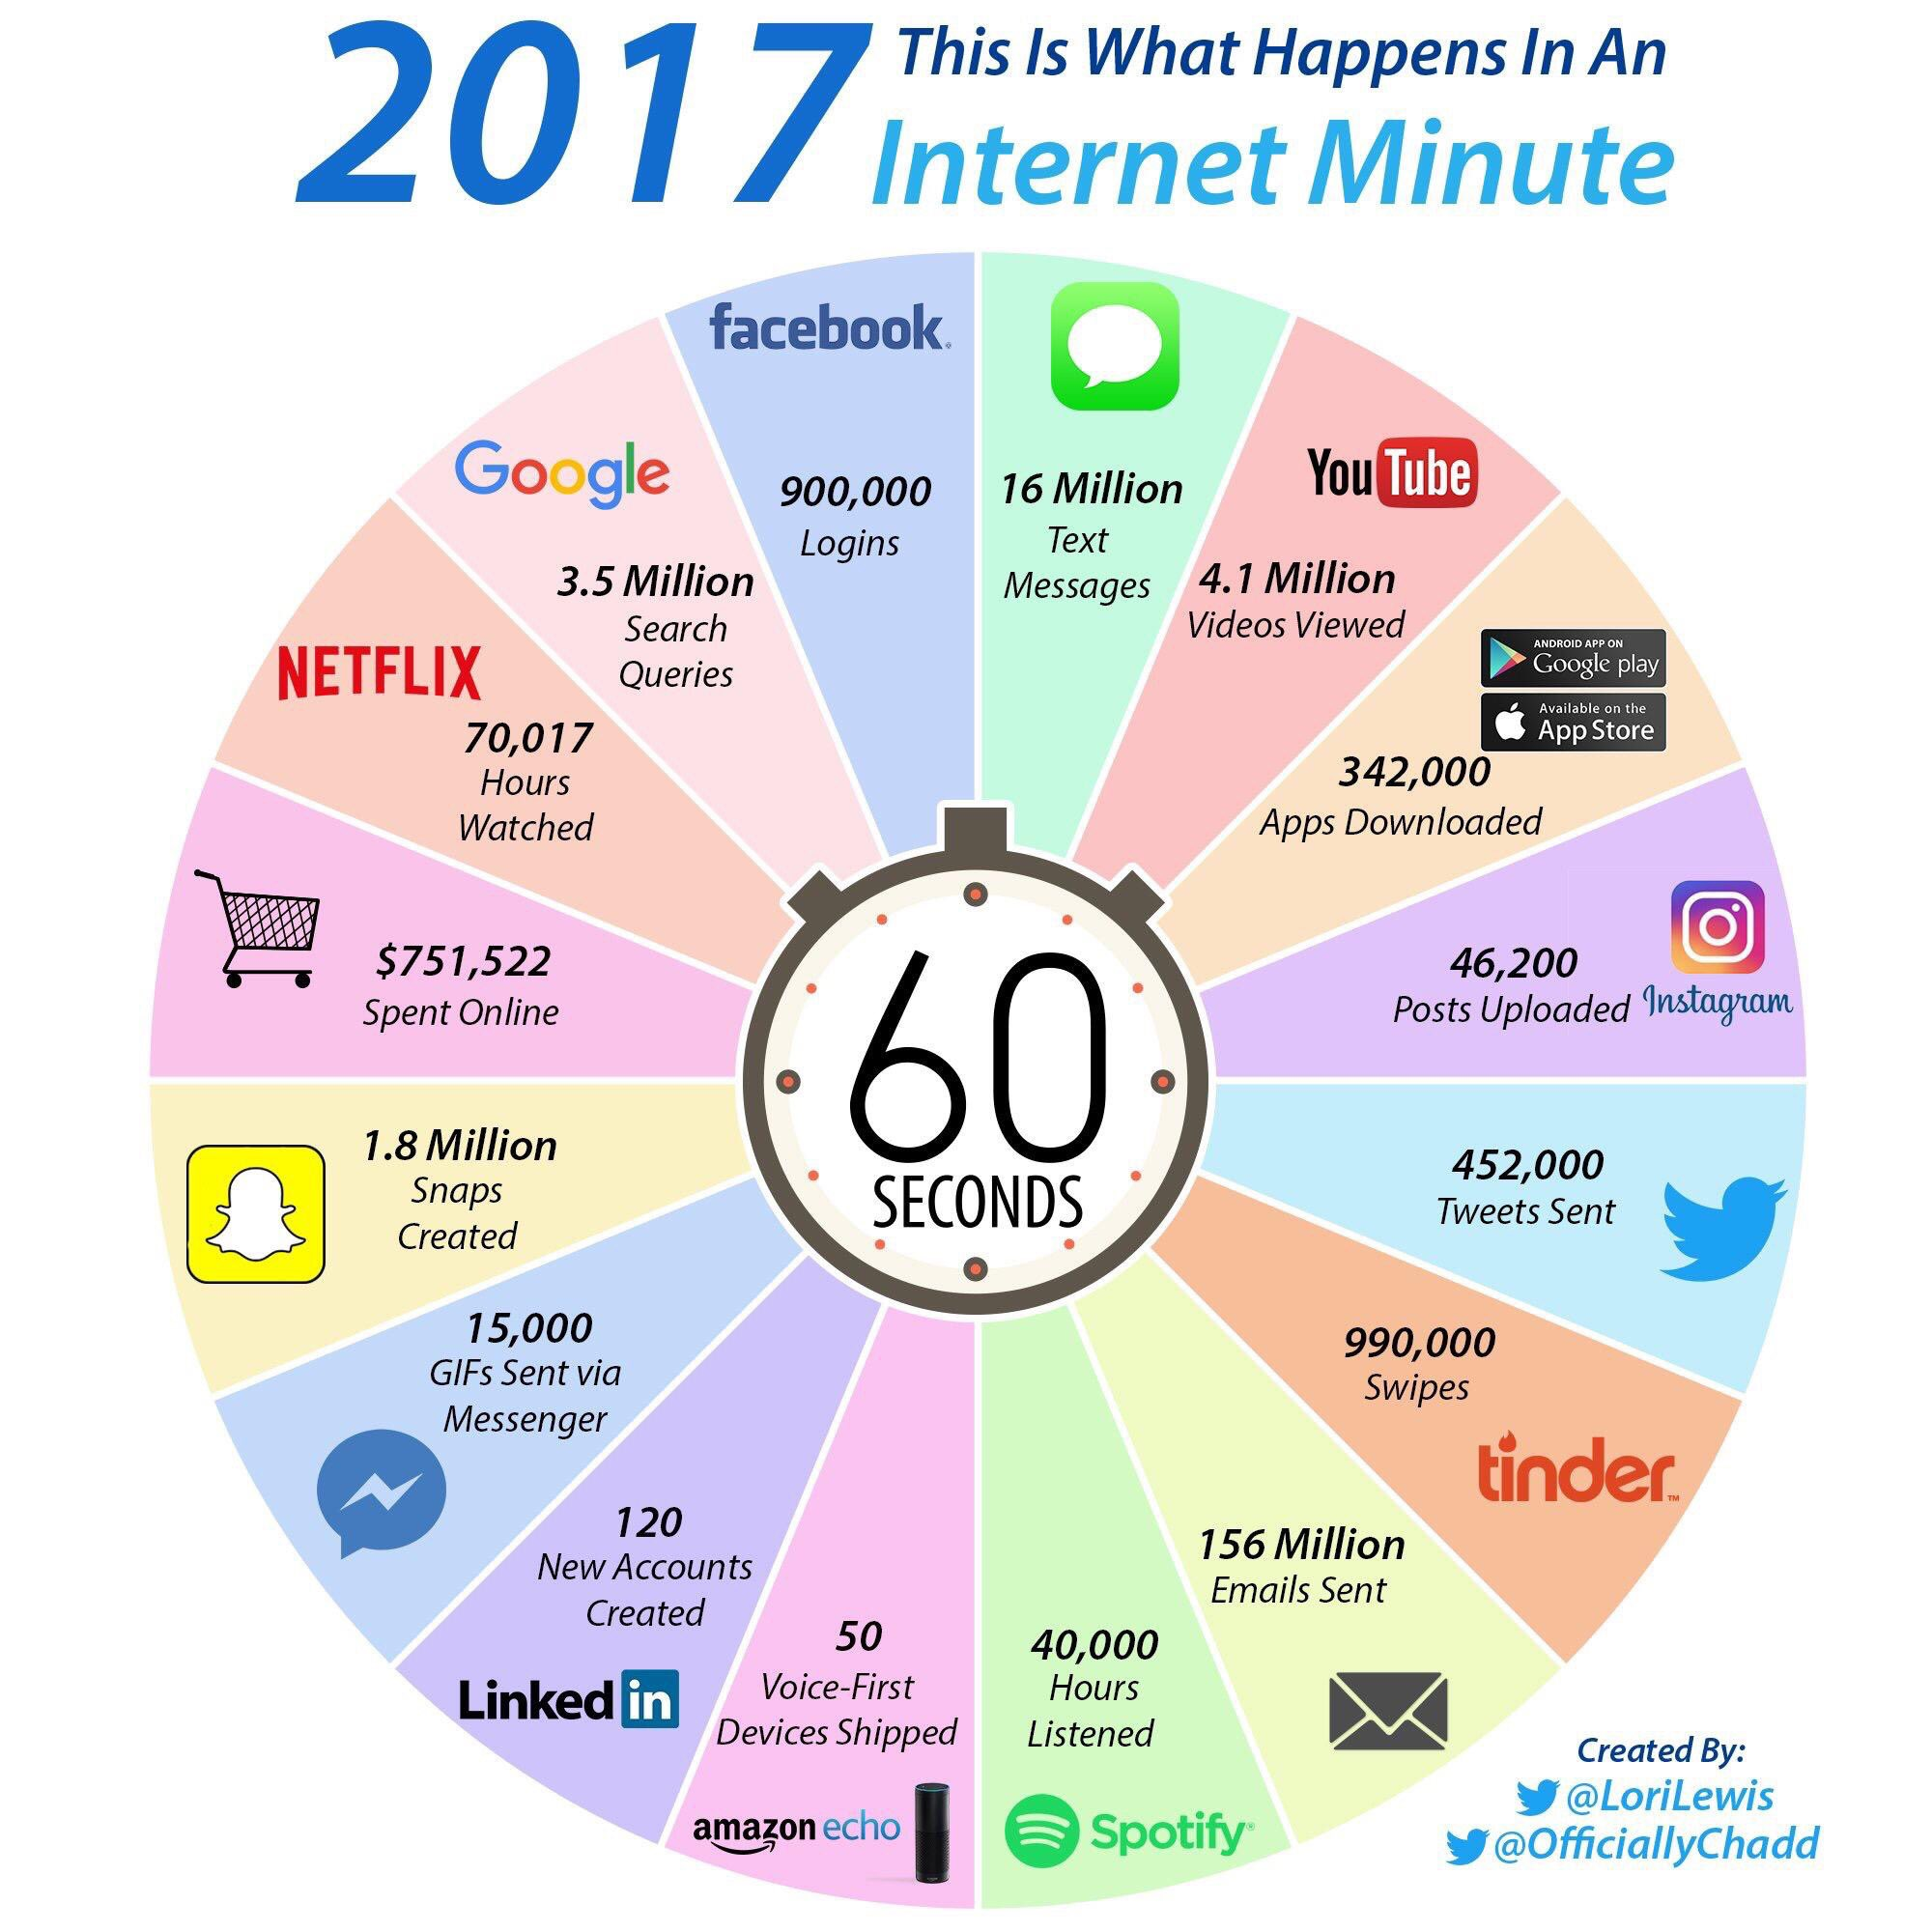 Qué sucede en Internet en un minuto #infografia #infographic #socialmedia